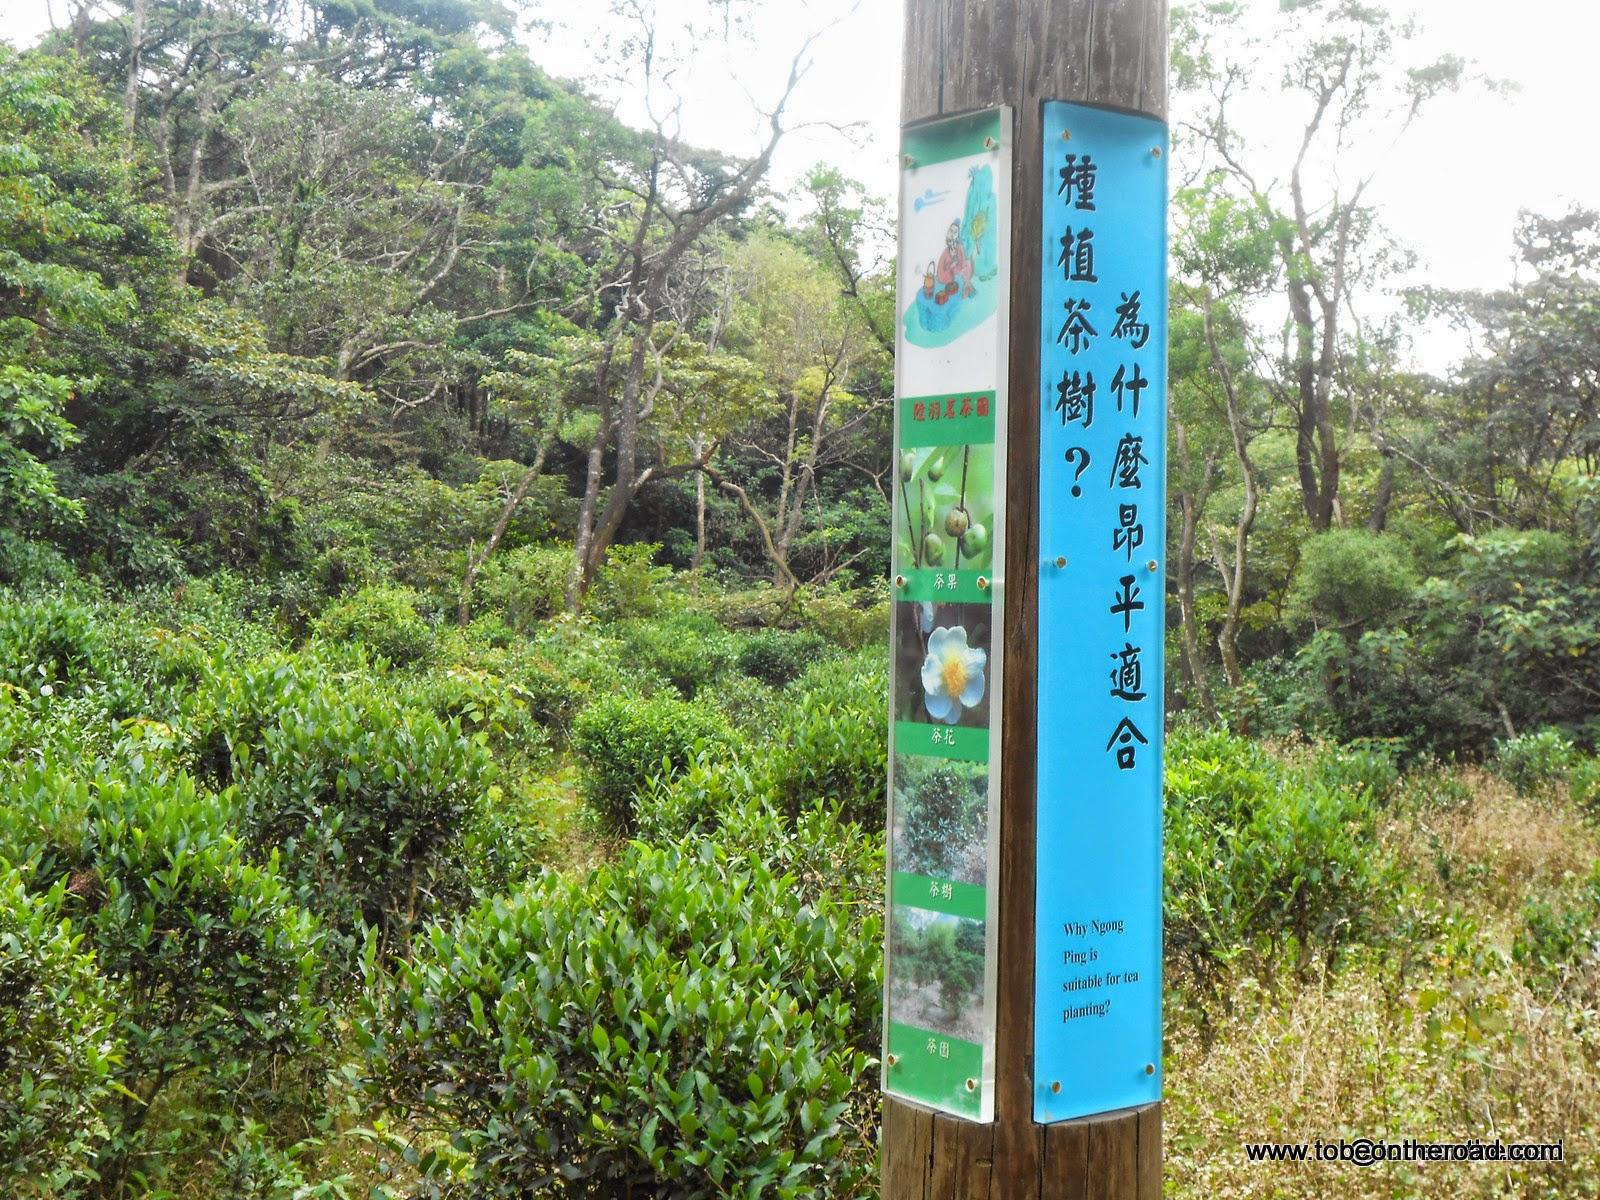 Hiking,Hongkong,Trail,South East Asia